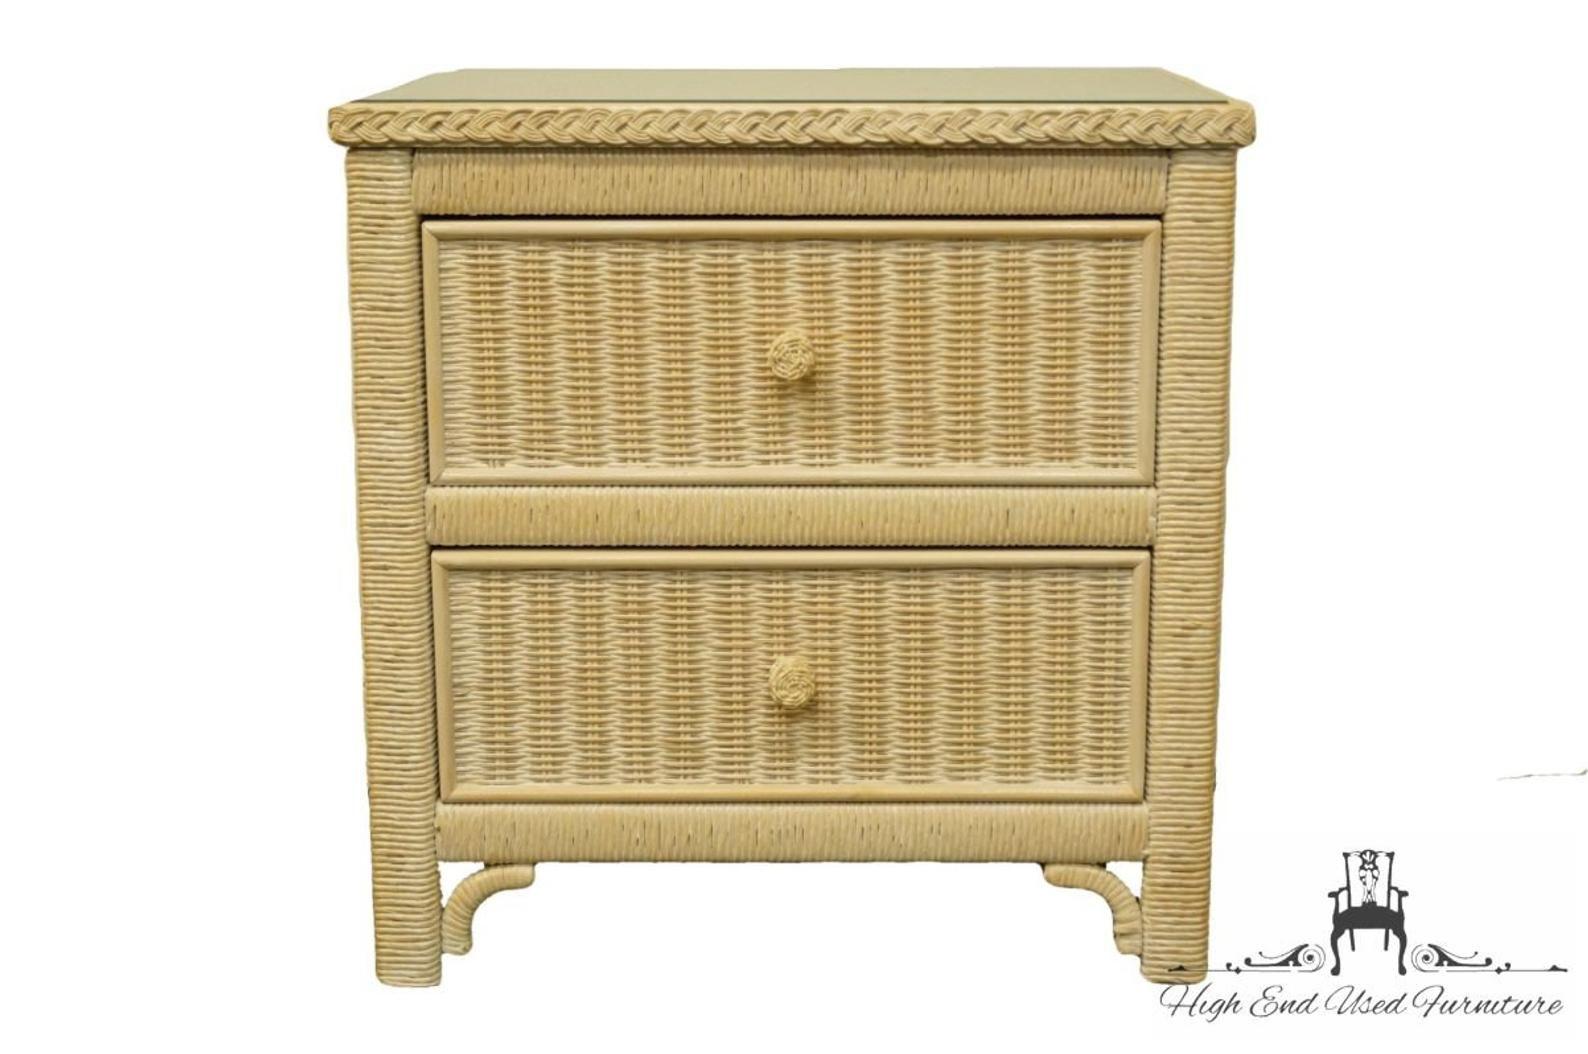 Lexington / Henry Link Furniture Cream / Offwhite Wicker